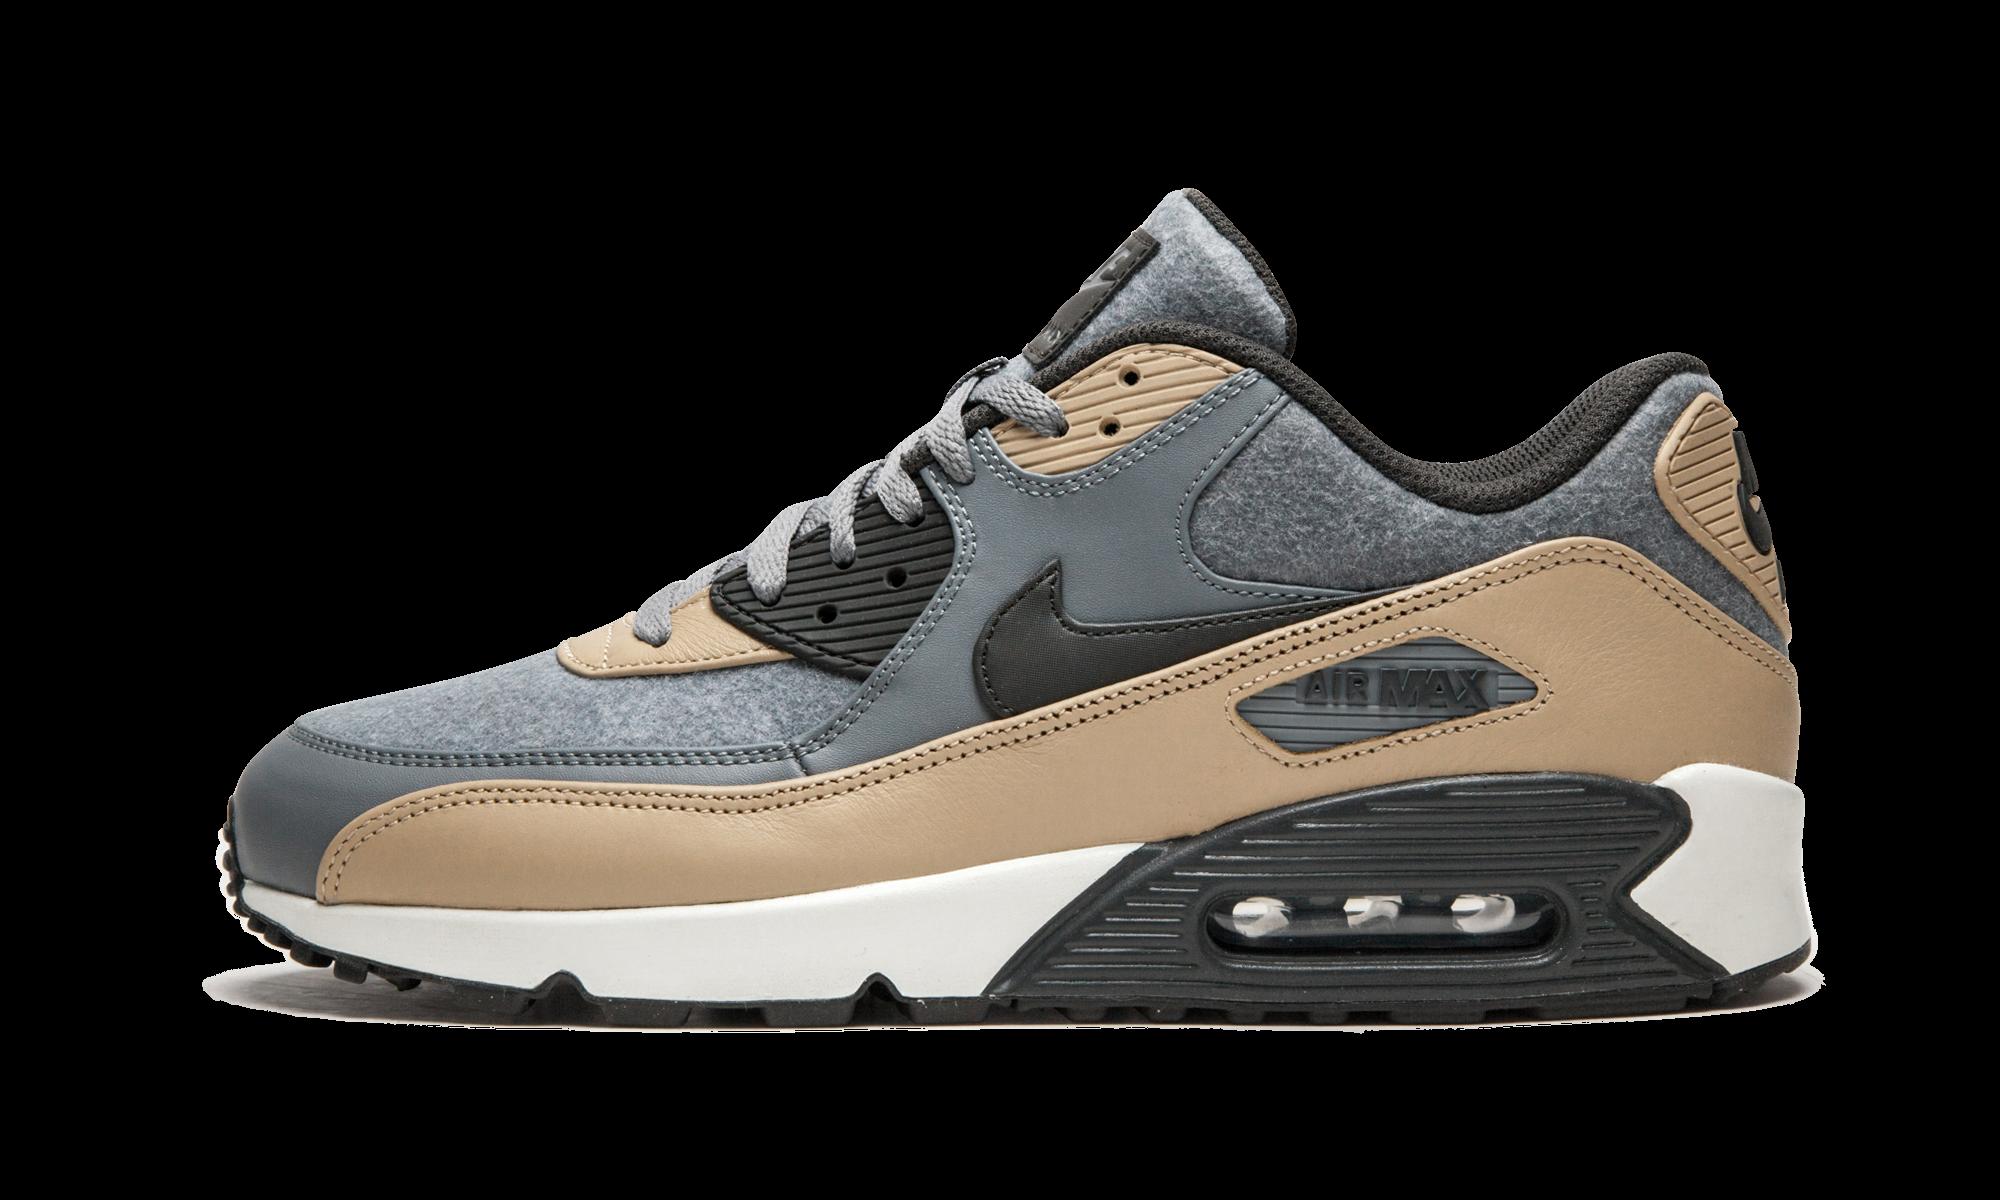 Nike Air Max 90 Premium 700155 010 | Air max 90, Air max